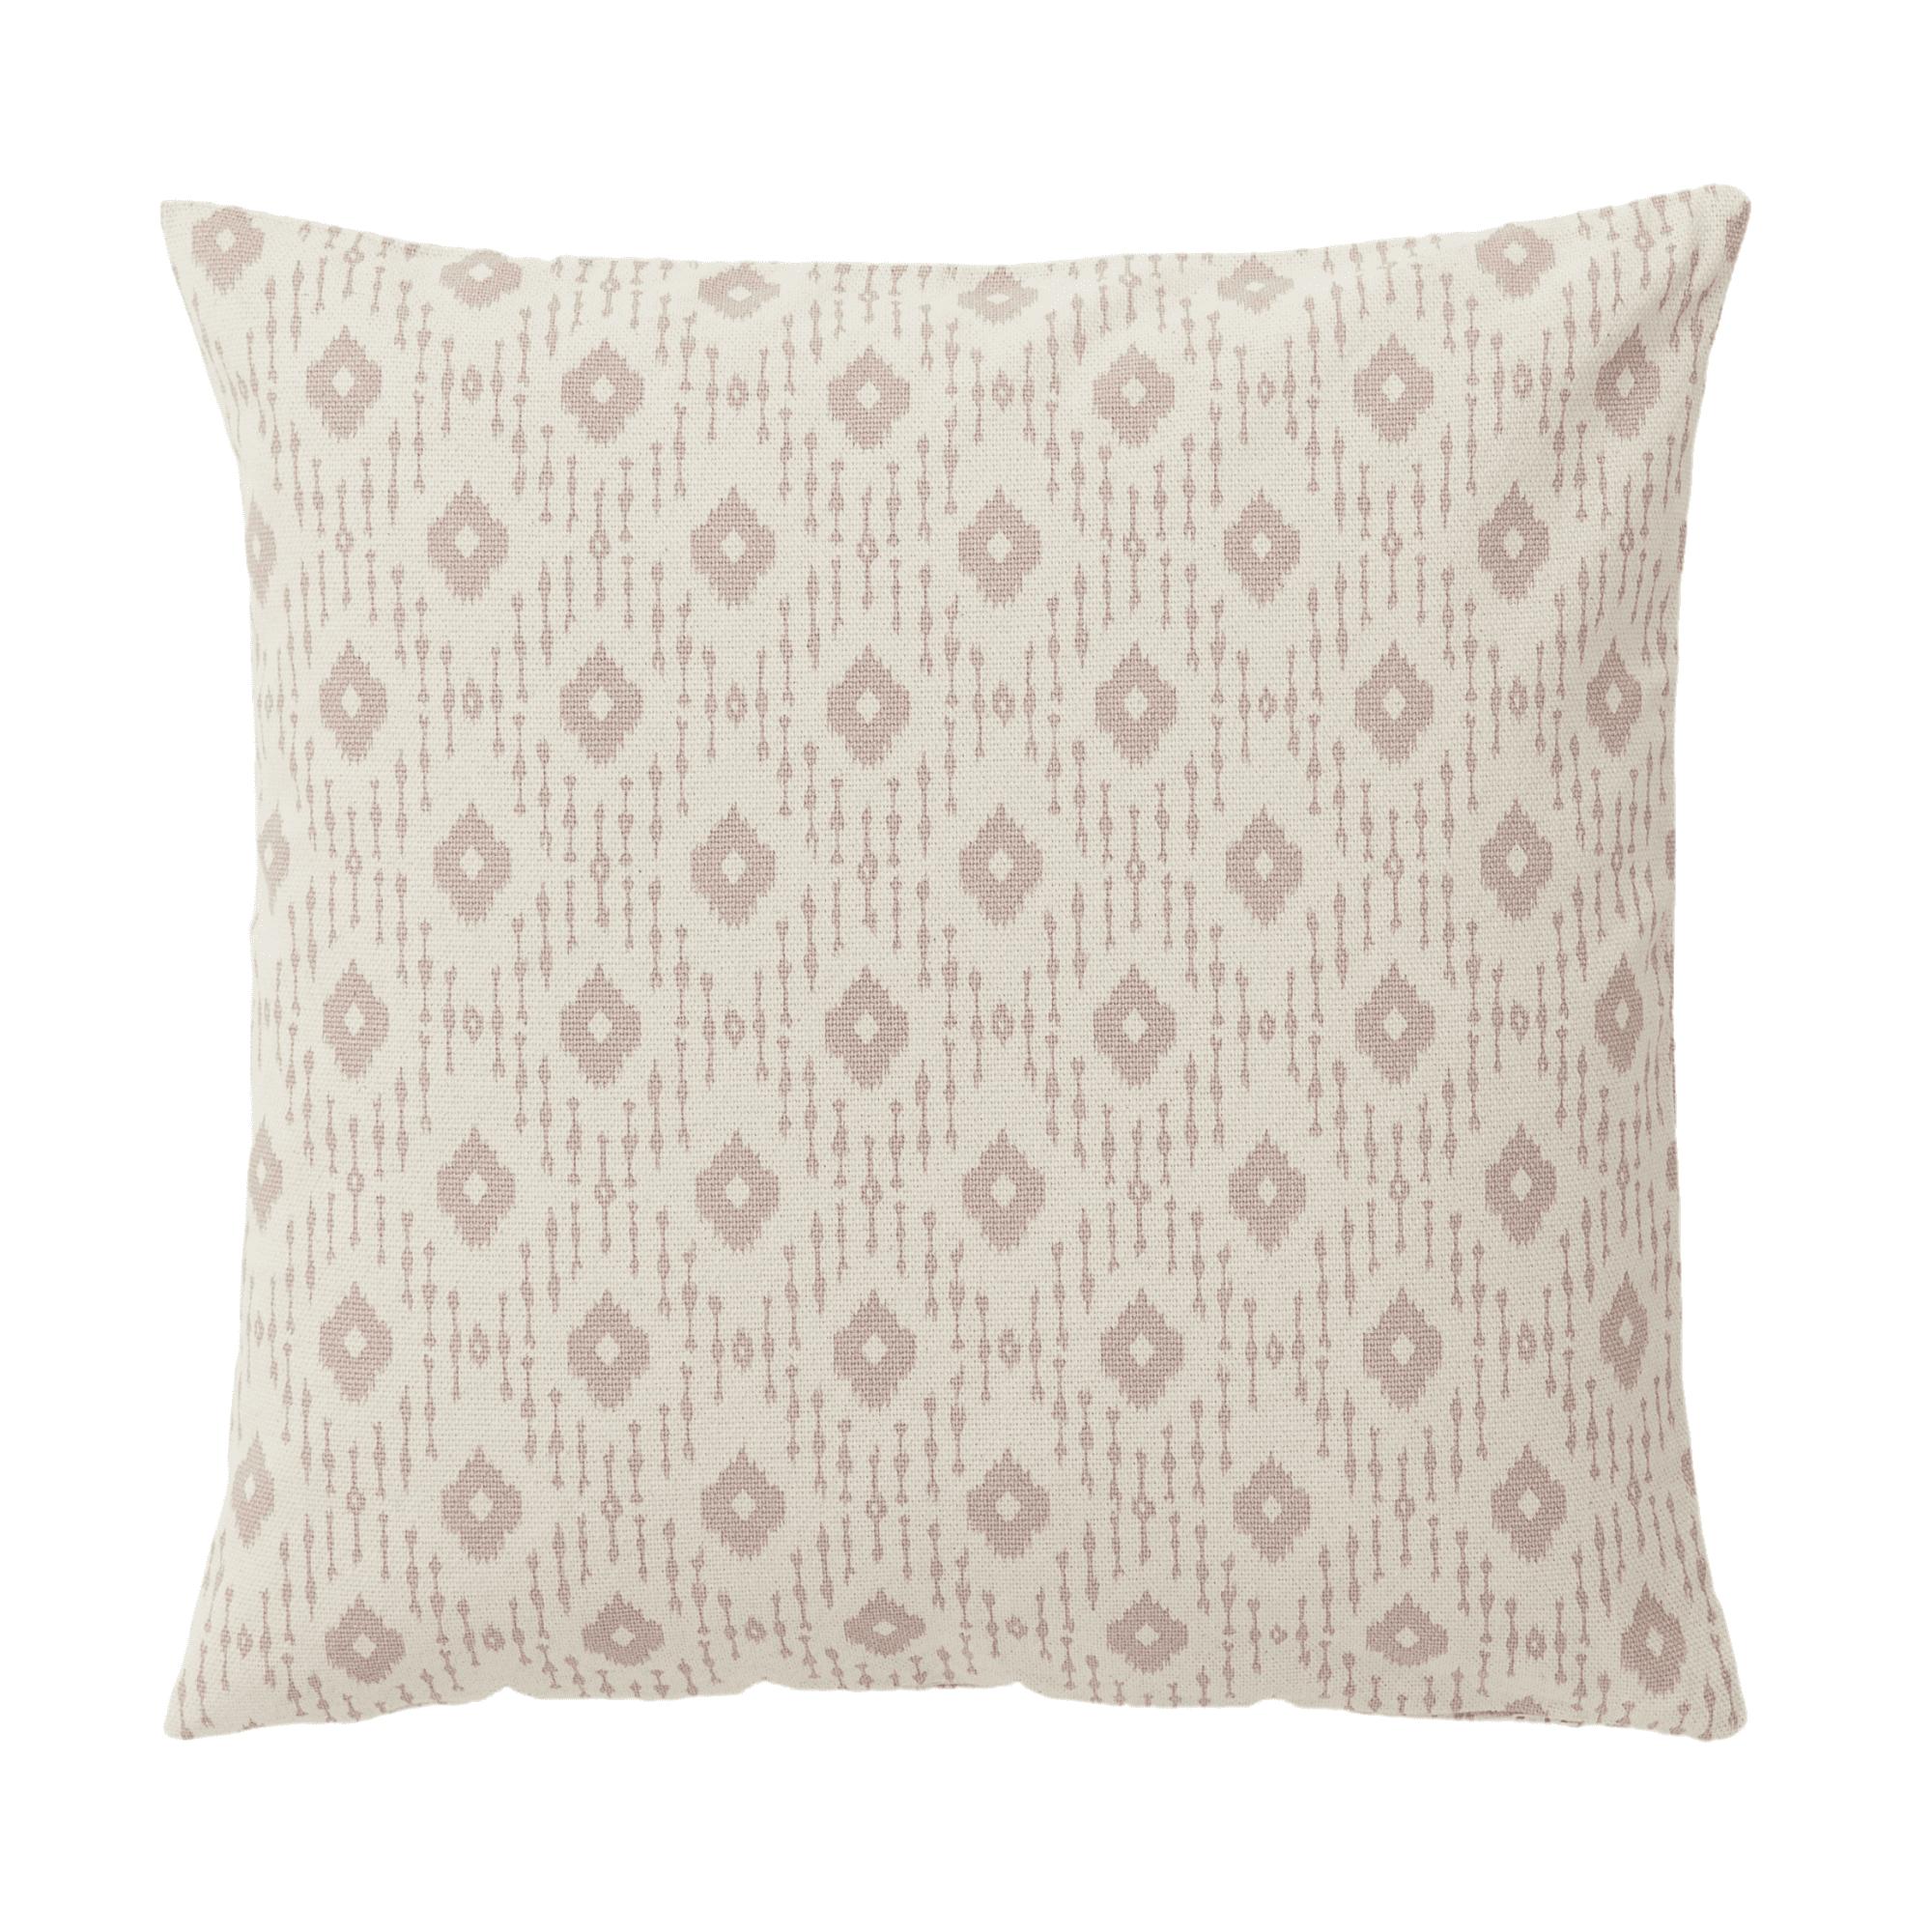 Amelia block print cushion